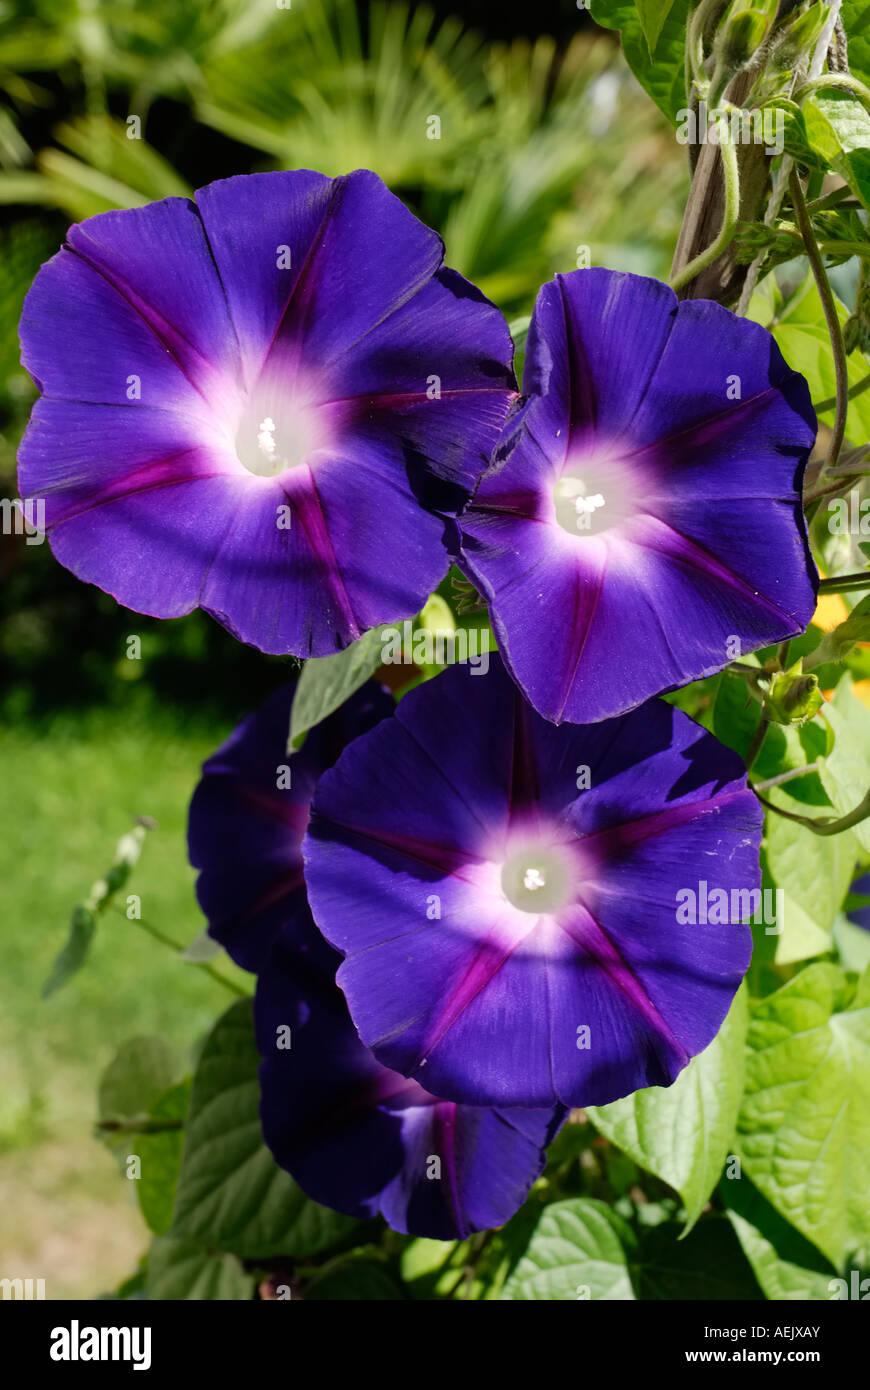 Purple blue flowers of Ipomeae violacea, Convolvulariaceae in bright sunshine Stock Photo